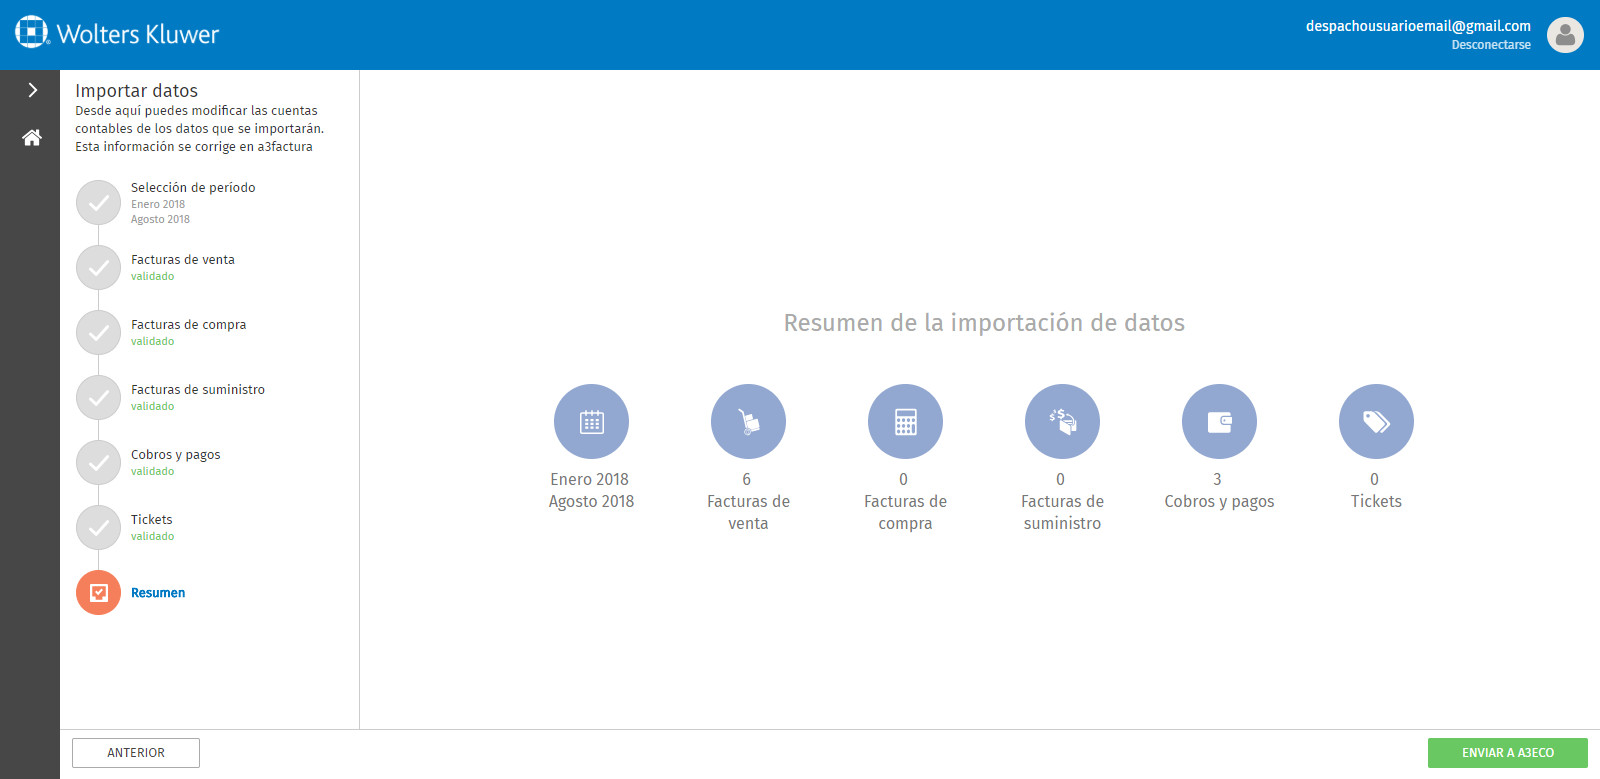 Portal a3factura Importar datos Resumen